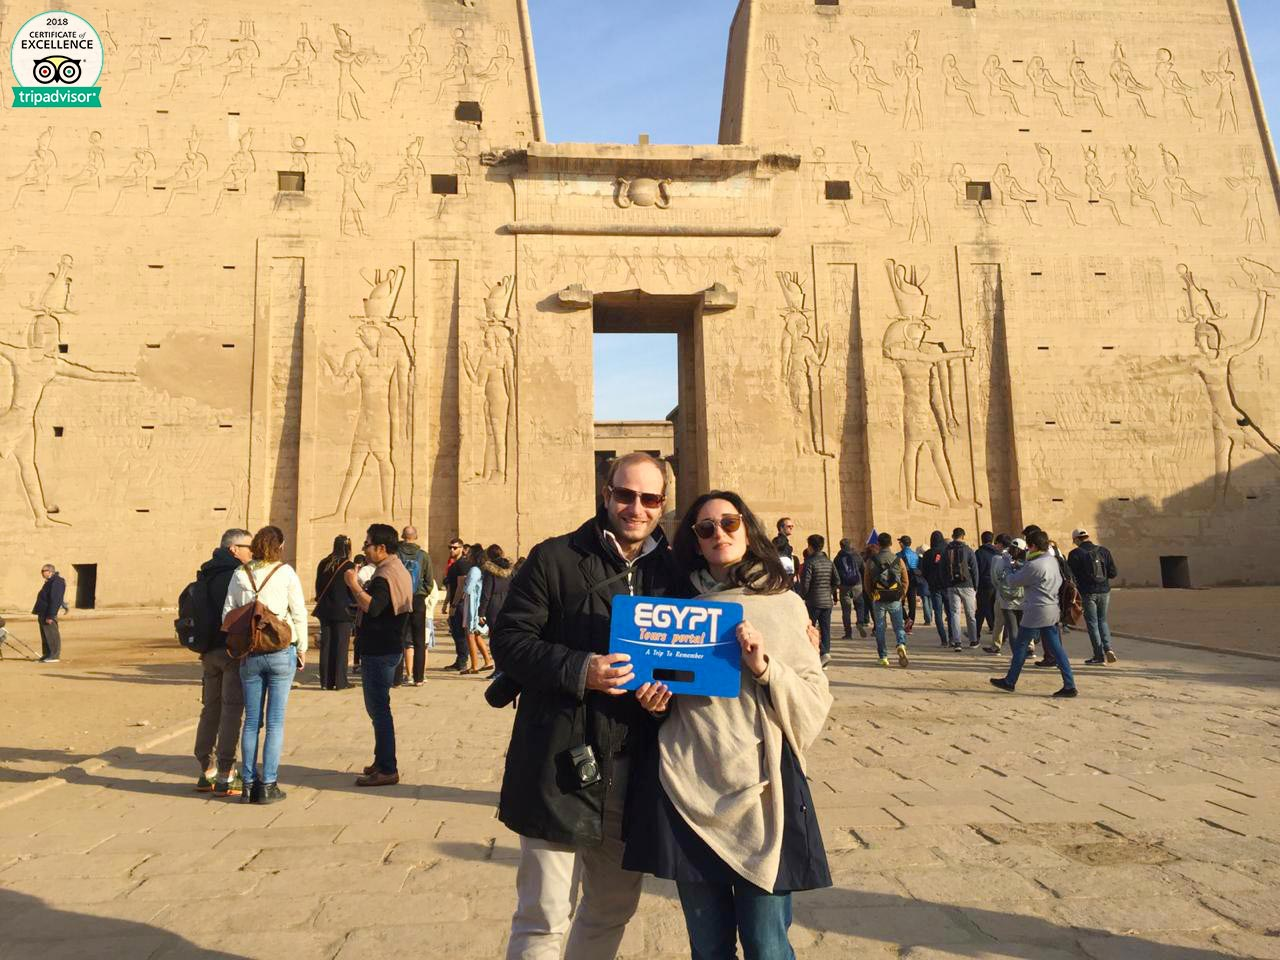 Egypt tours from Cairo Airport - Egypt Tours Portal